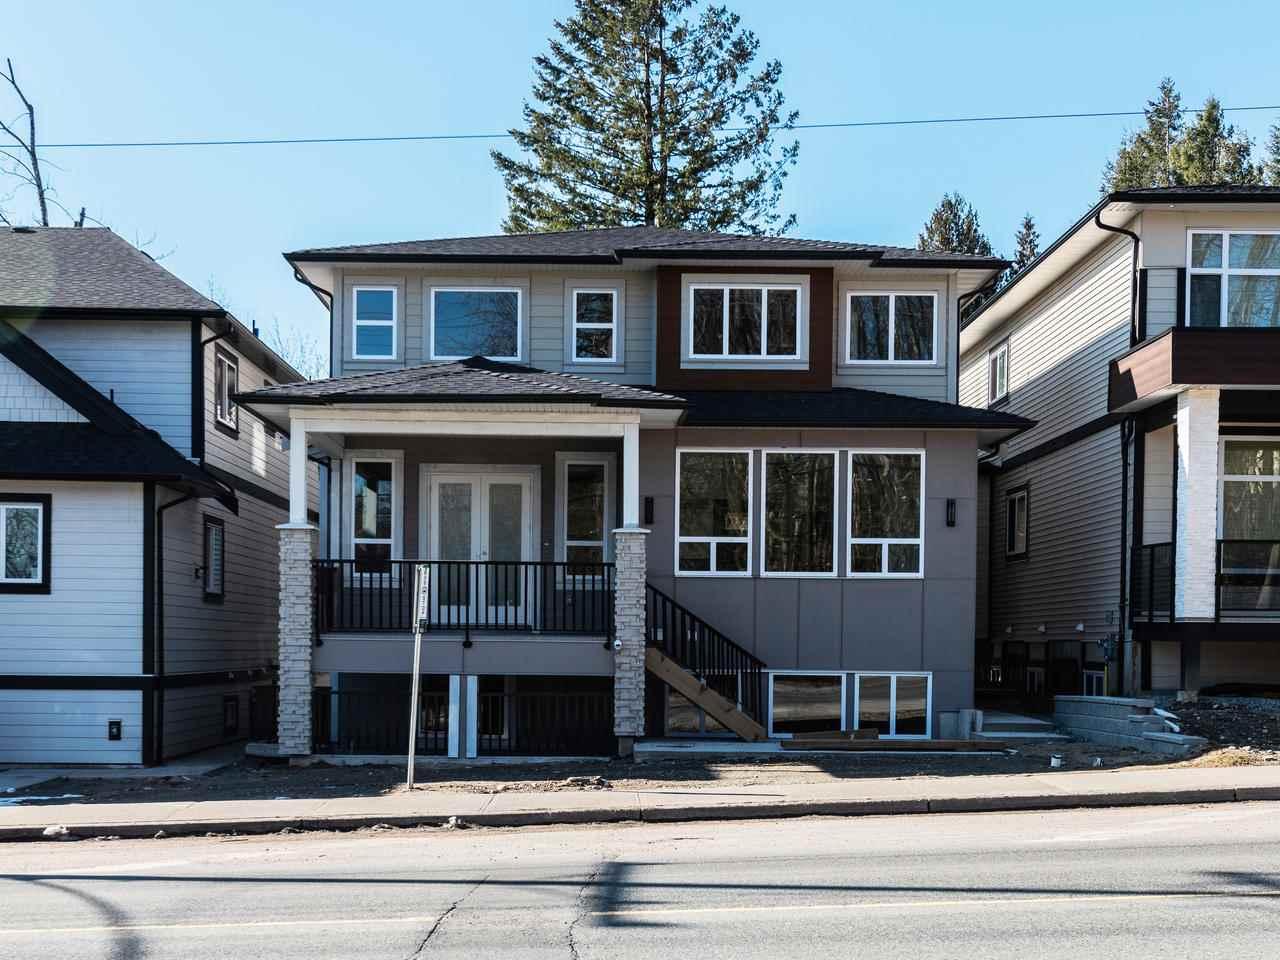 7875 CEDAR STREET, 6 bed, 6 bath, at $1,069,000